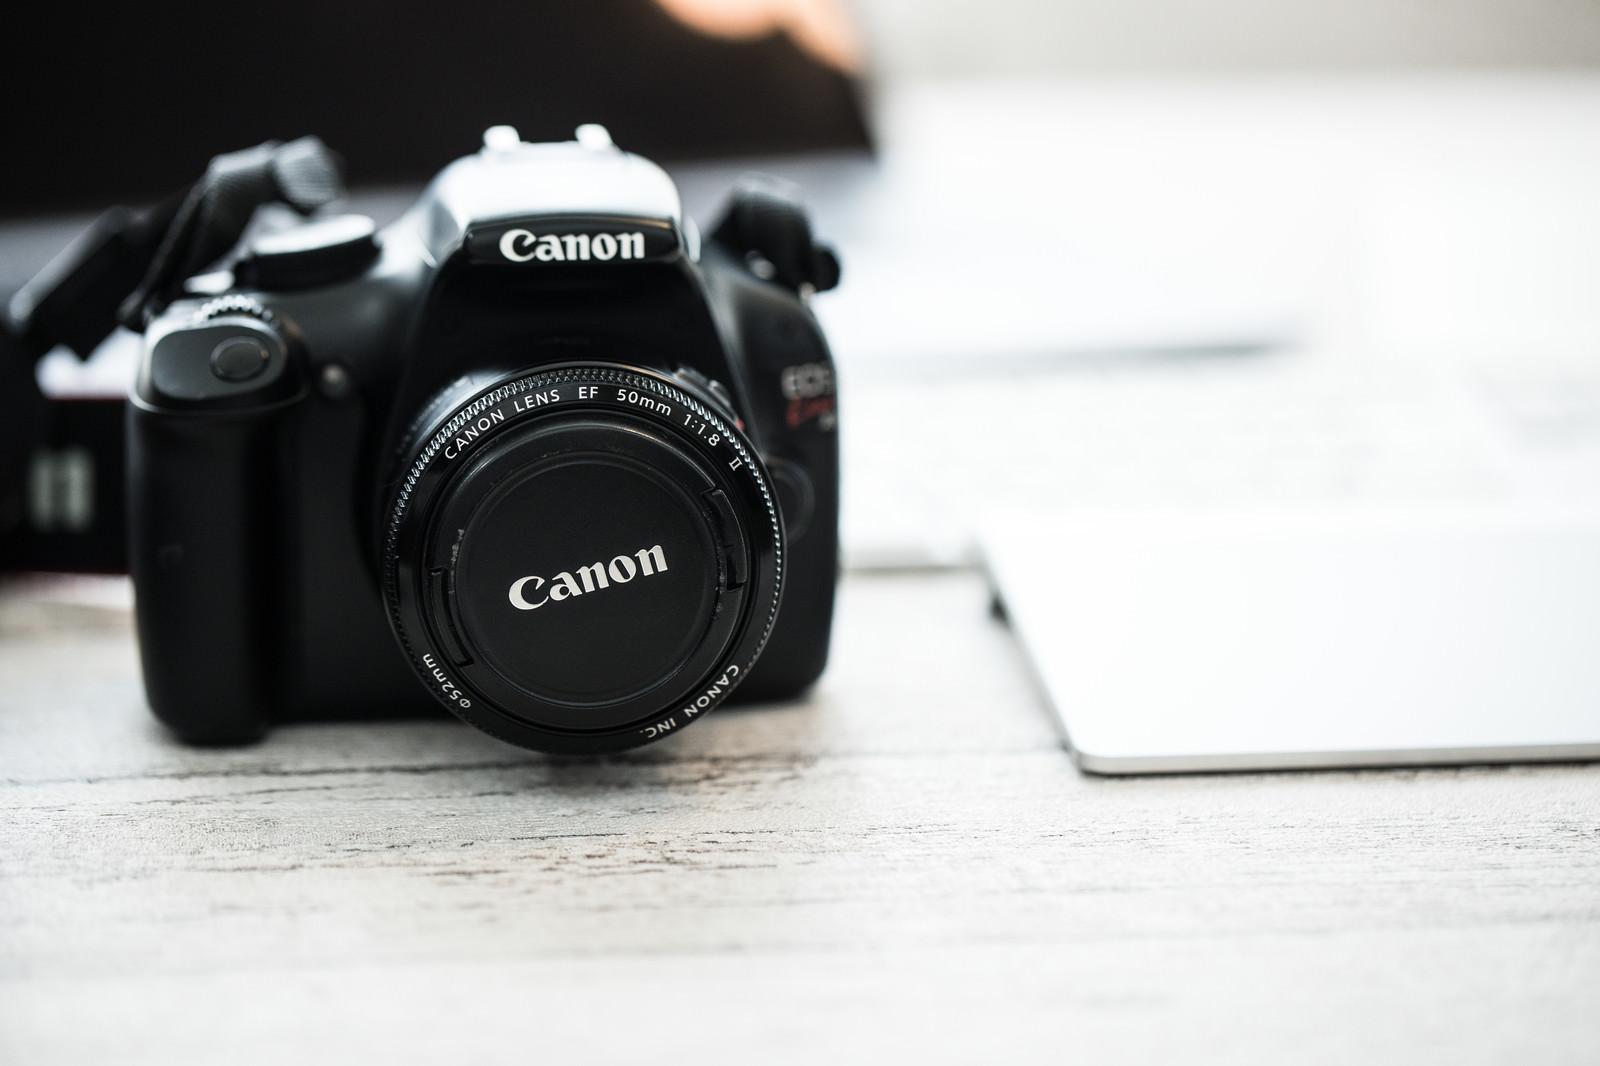 「Canonのデジタル一眼レフカメラ」の写真